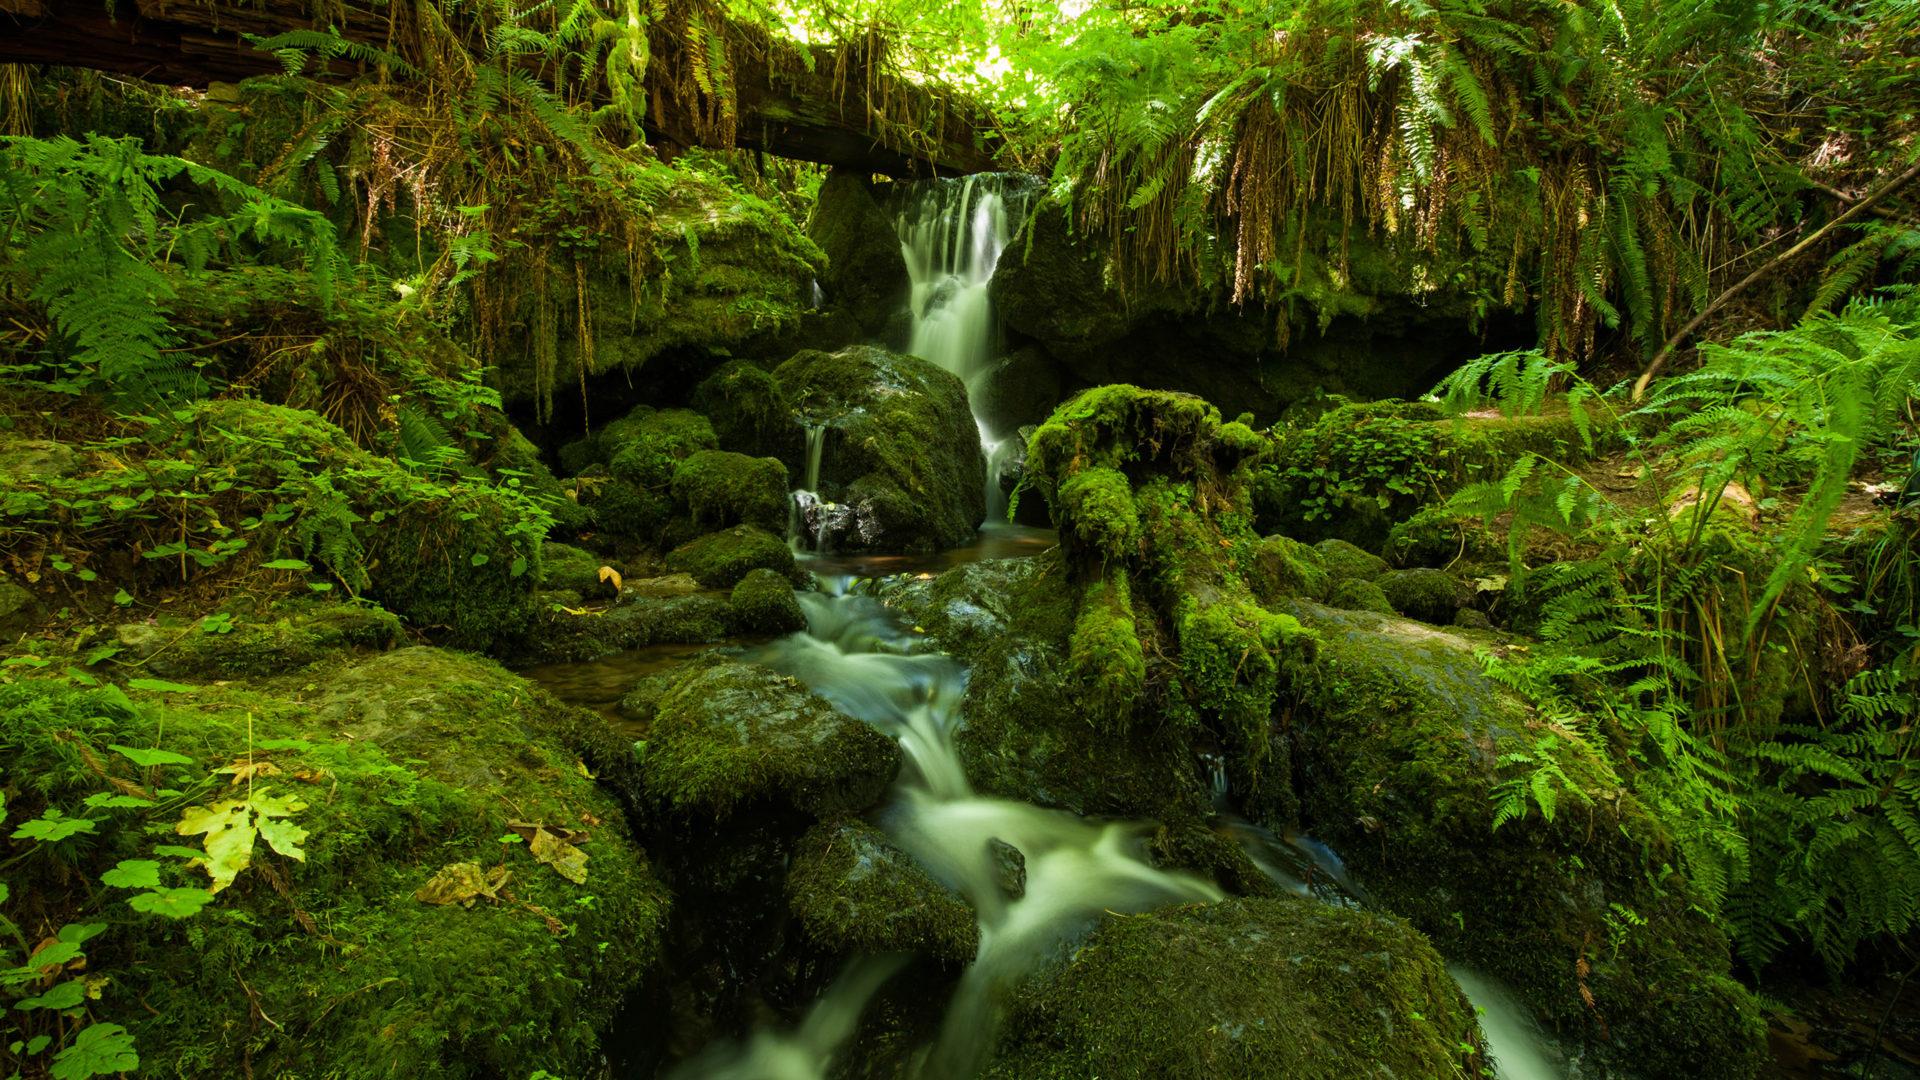 Havasu Falls Arizona Wallpaper Jungle Foliage Dense Vegetation And Mountainous River